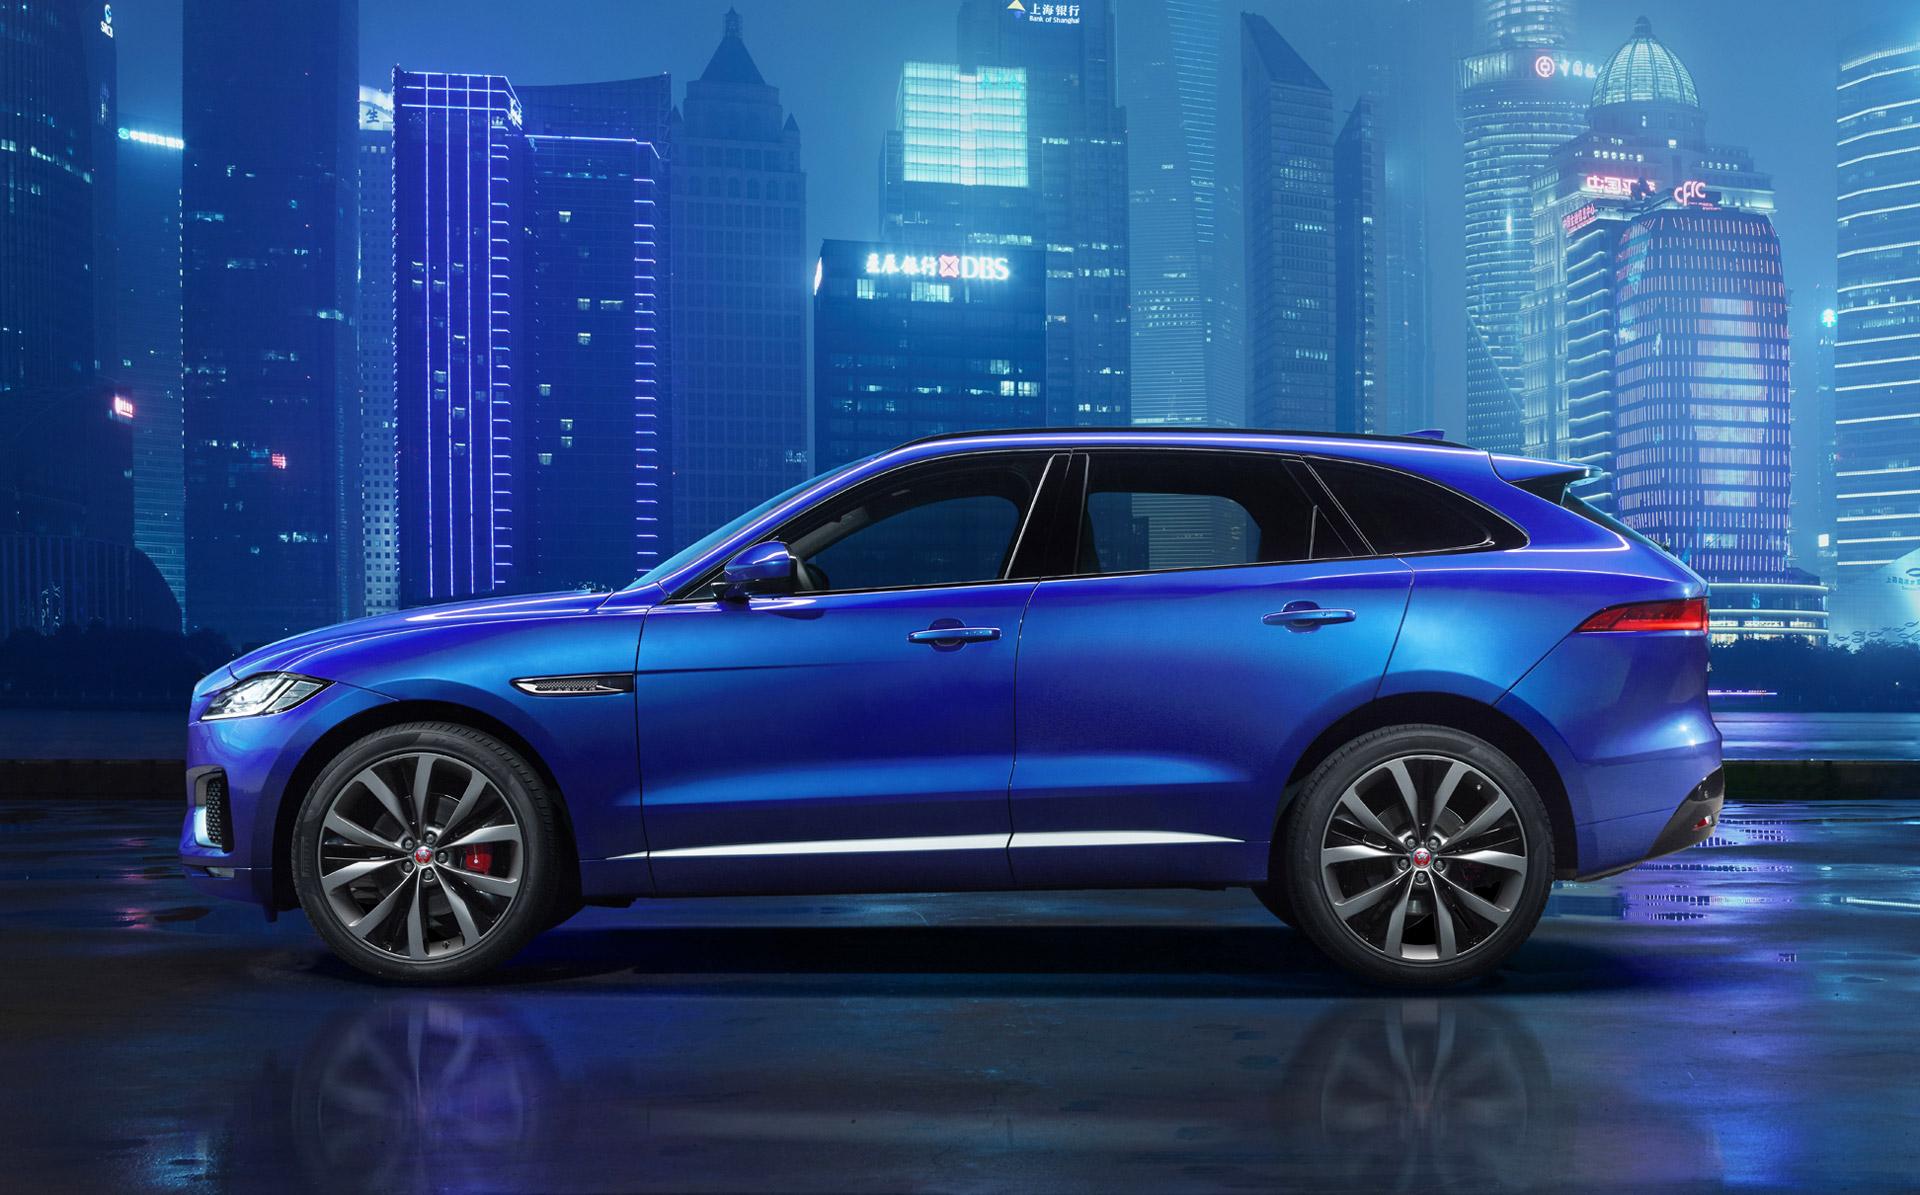 tesla model 3 2016 vw tiguan 2017 jaguar f pace what s new the car connection. Black Bedroom Furniture Sets. Home Design Ideas